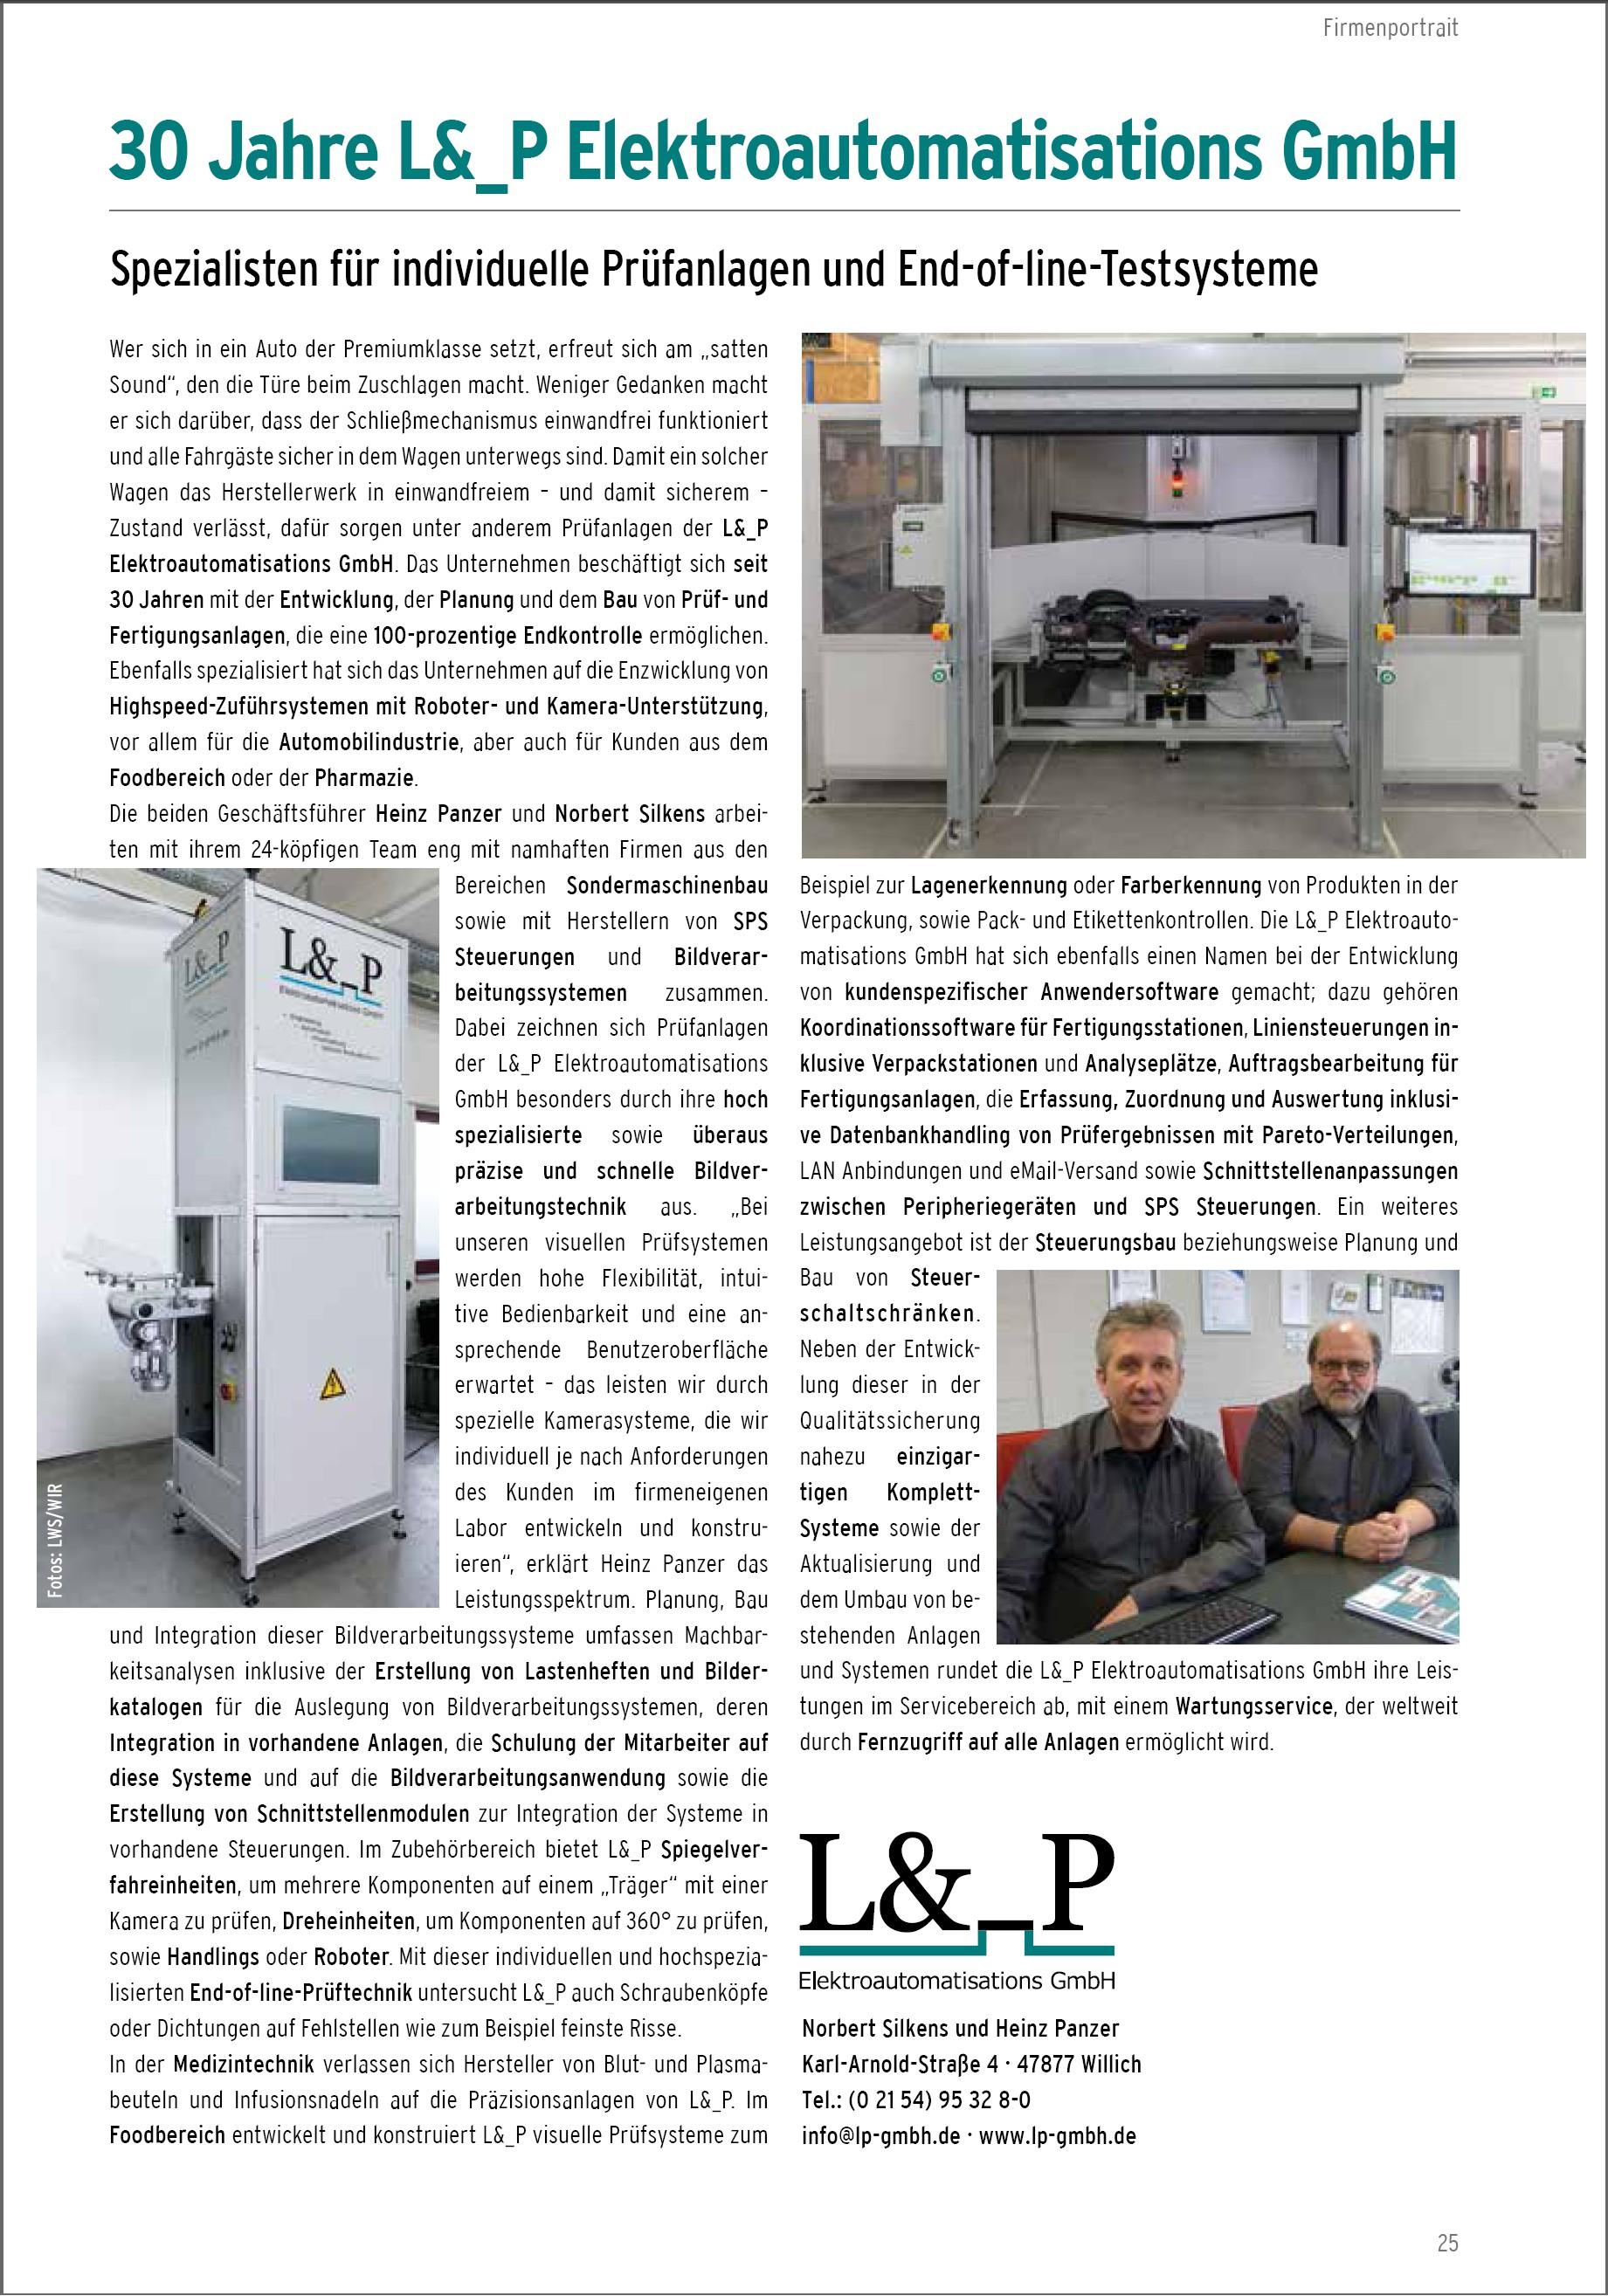 30 Years L&_P - Elektroautomations GmbH